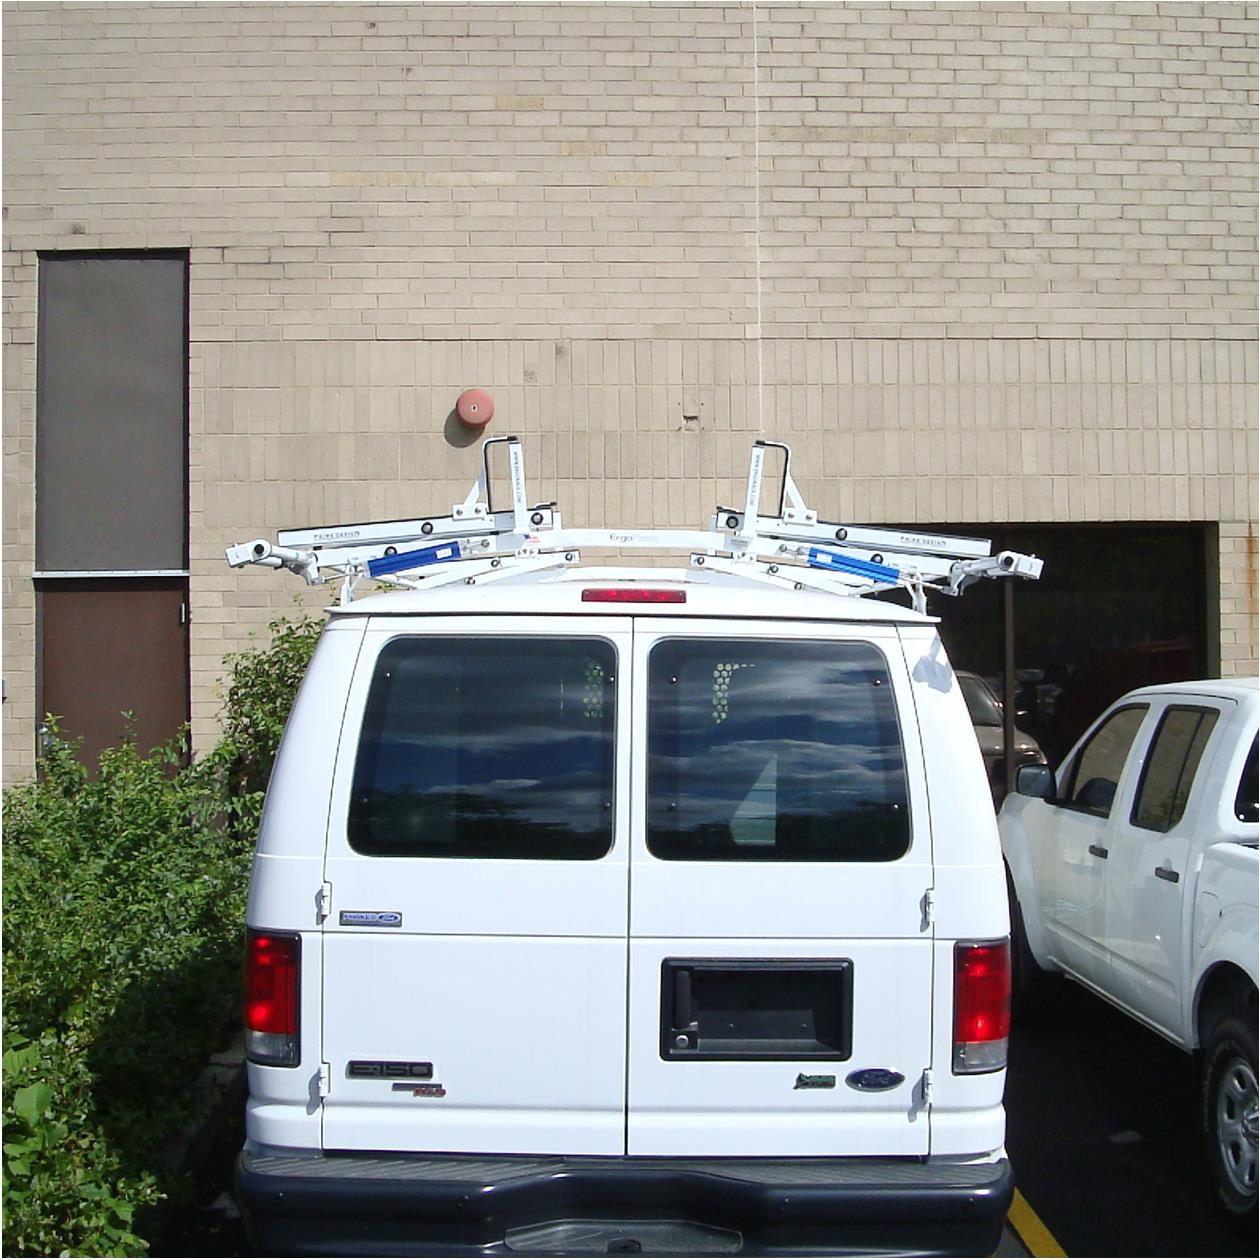 Ladder Rack for Suv Prime Design Ergorack Double Drop Down Ladder Rack for ford